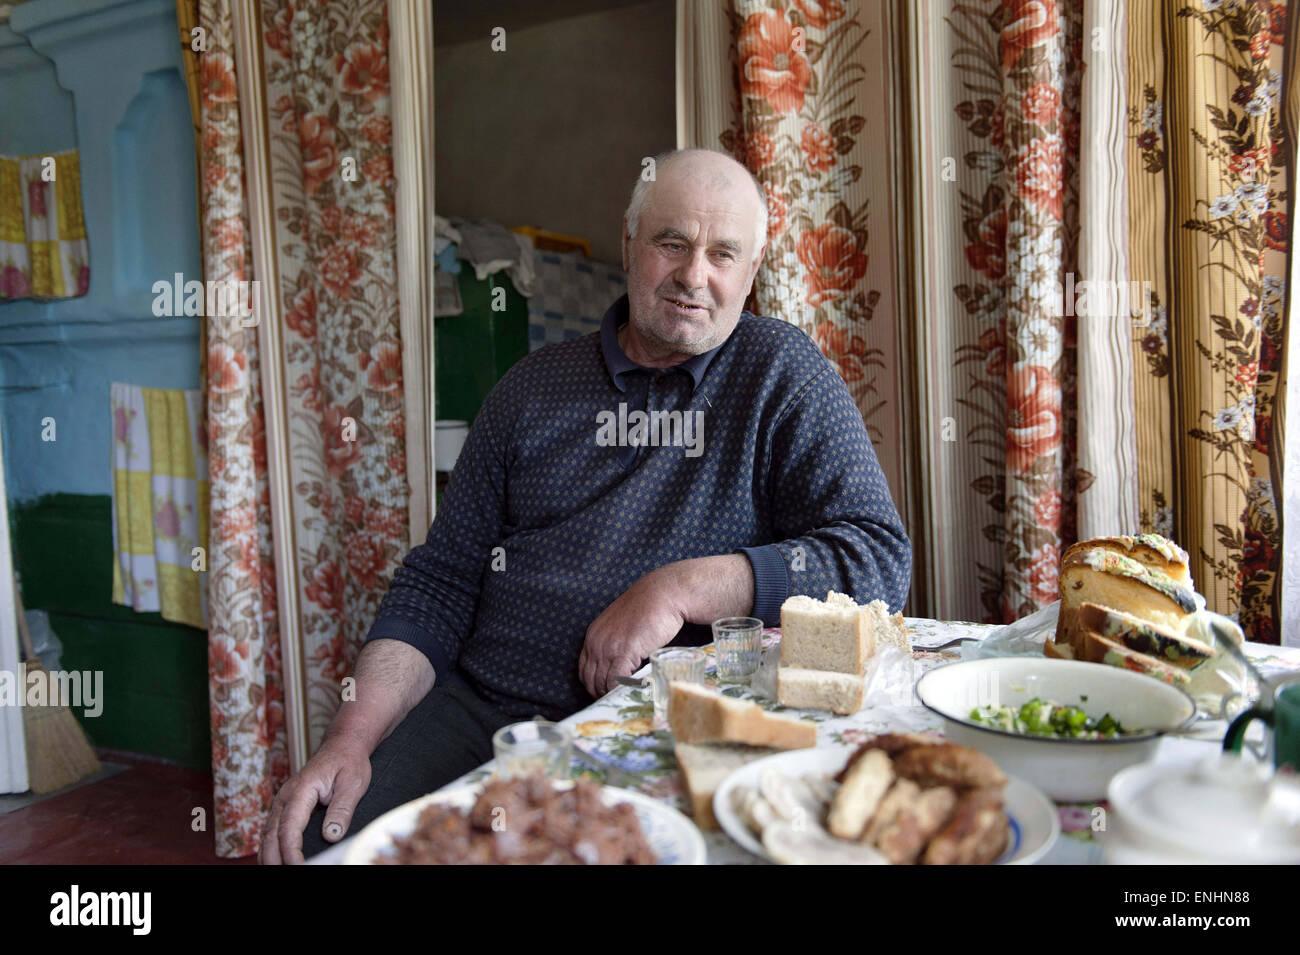 April 24, 2015 - Chernobyl, Ukraine - Ukraine. Pripyat. Chernobyl. Mr Lavriejenko. He is 59 years old...Several - Stock Image